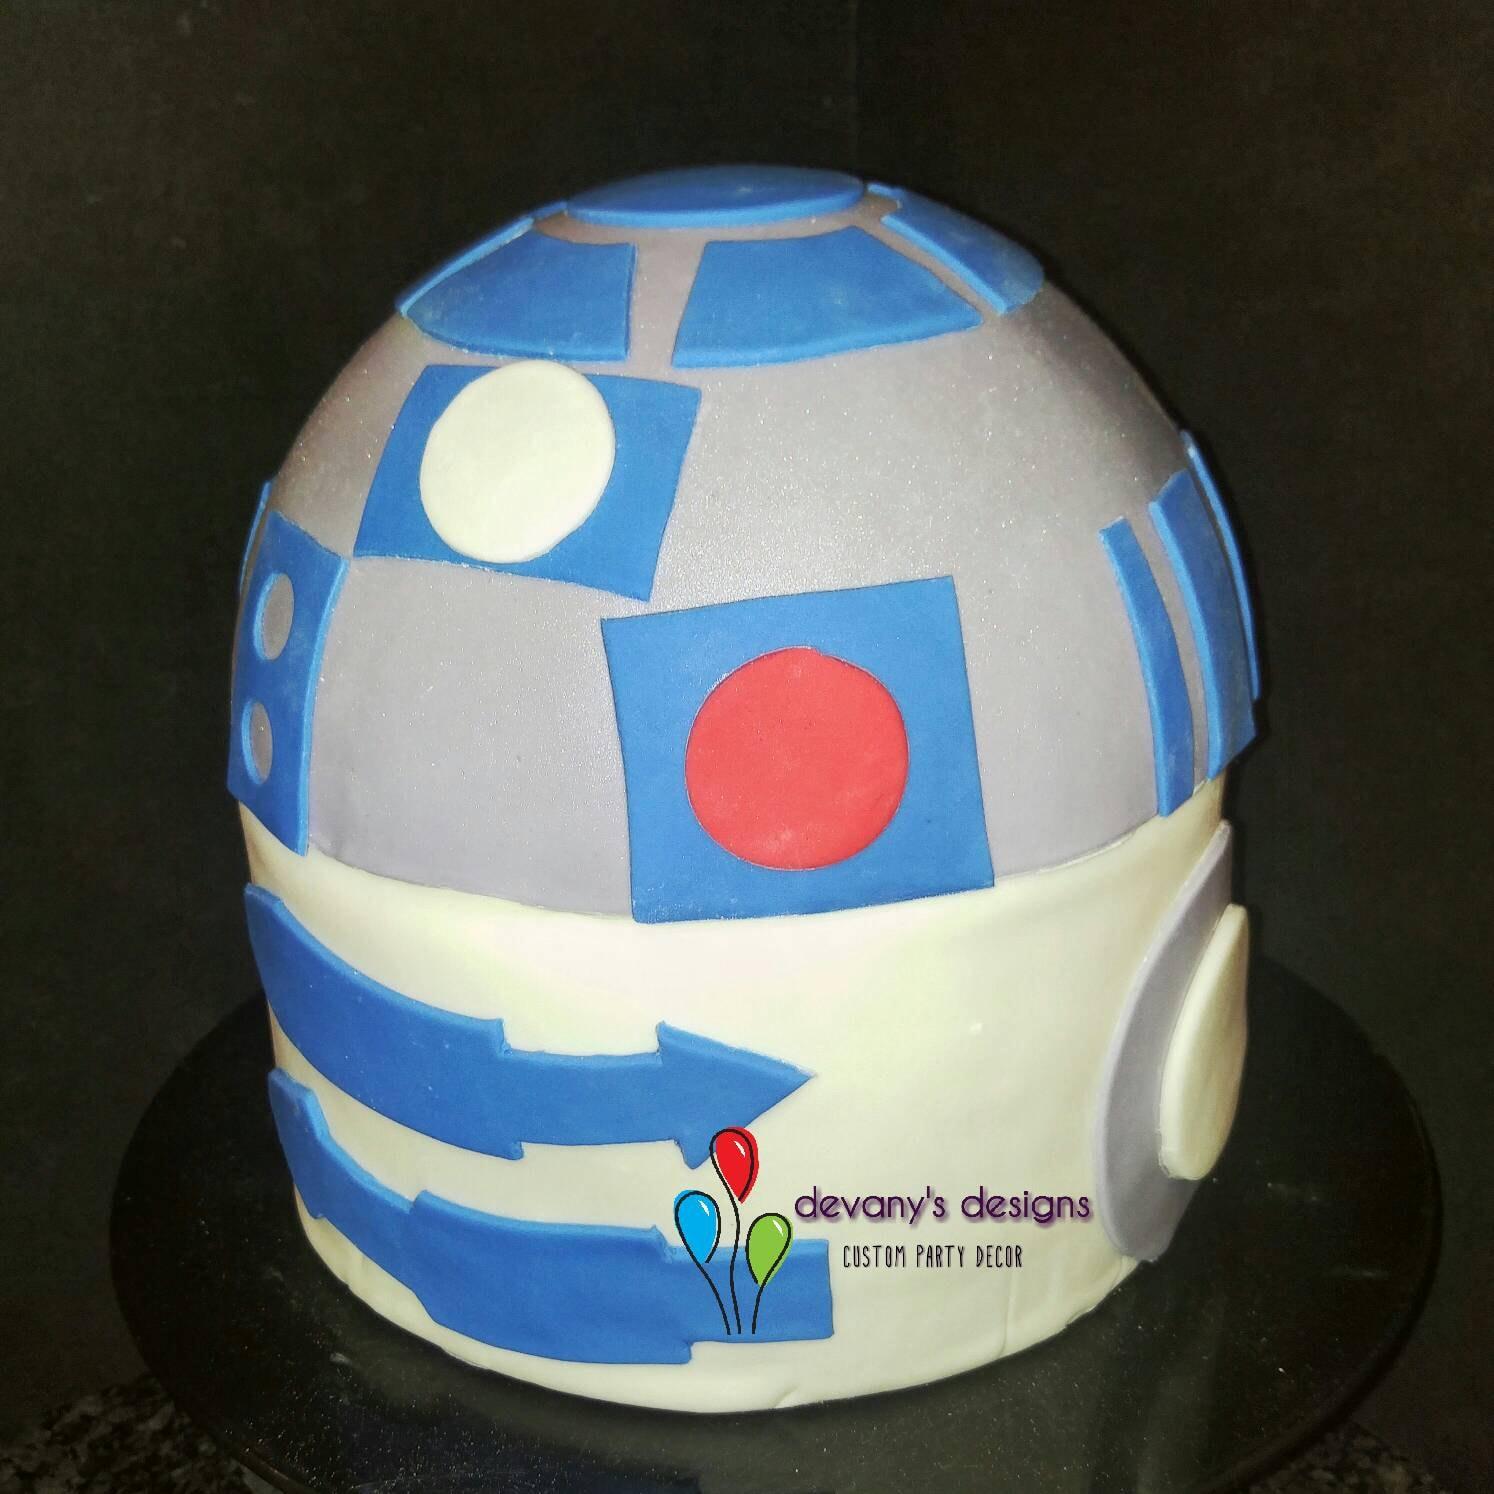 R2D2 Cake Topper R2D2 Birthday Cake Kit Edible R2D2 Star